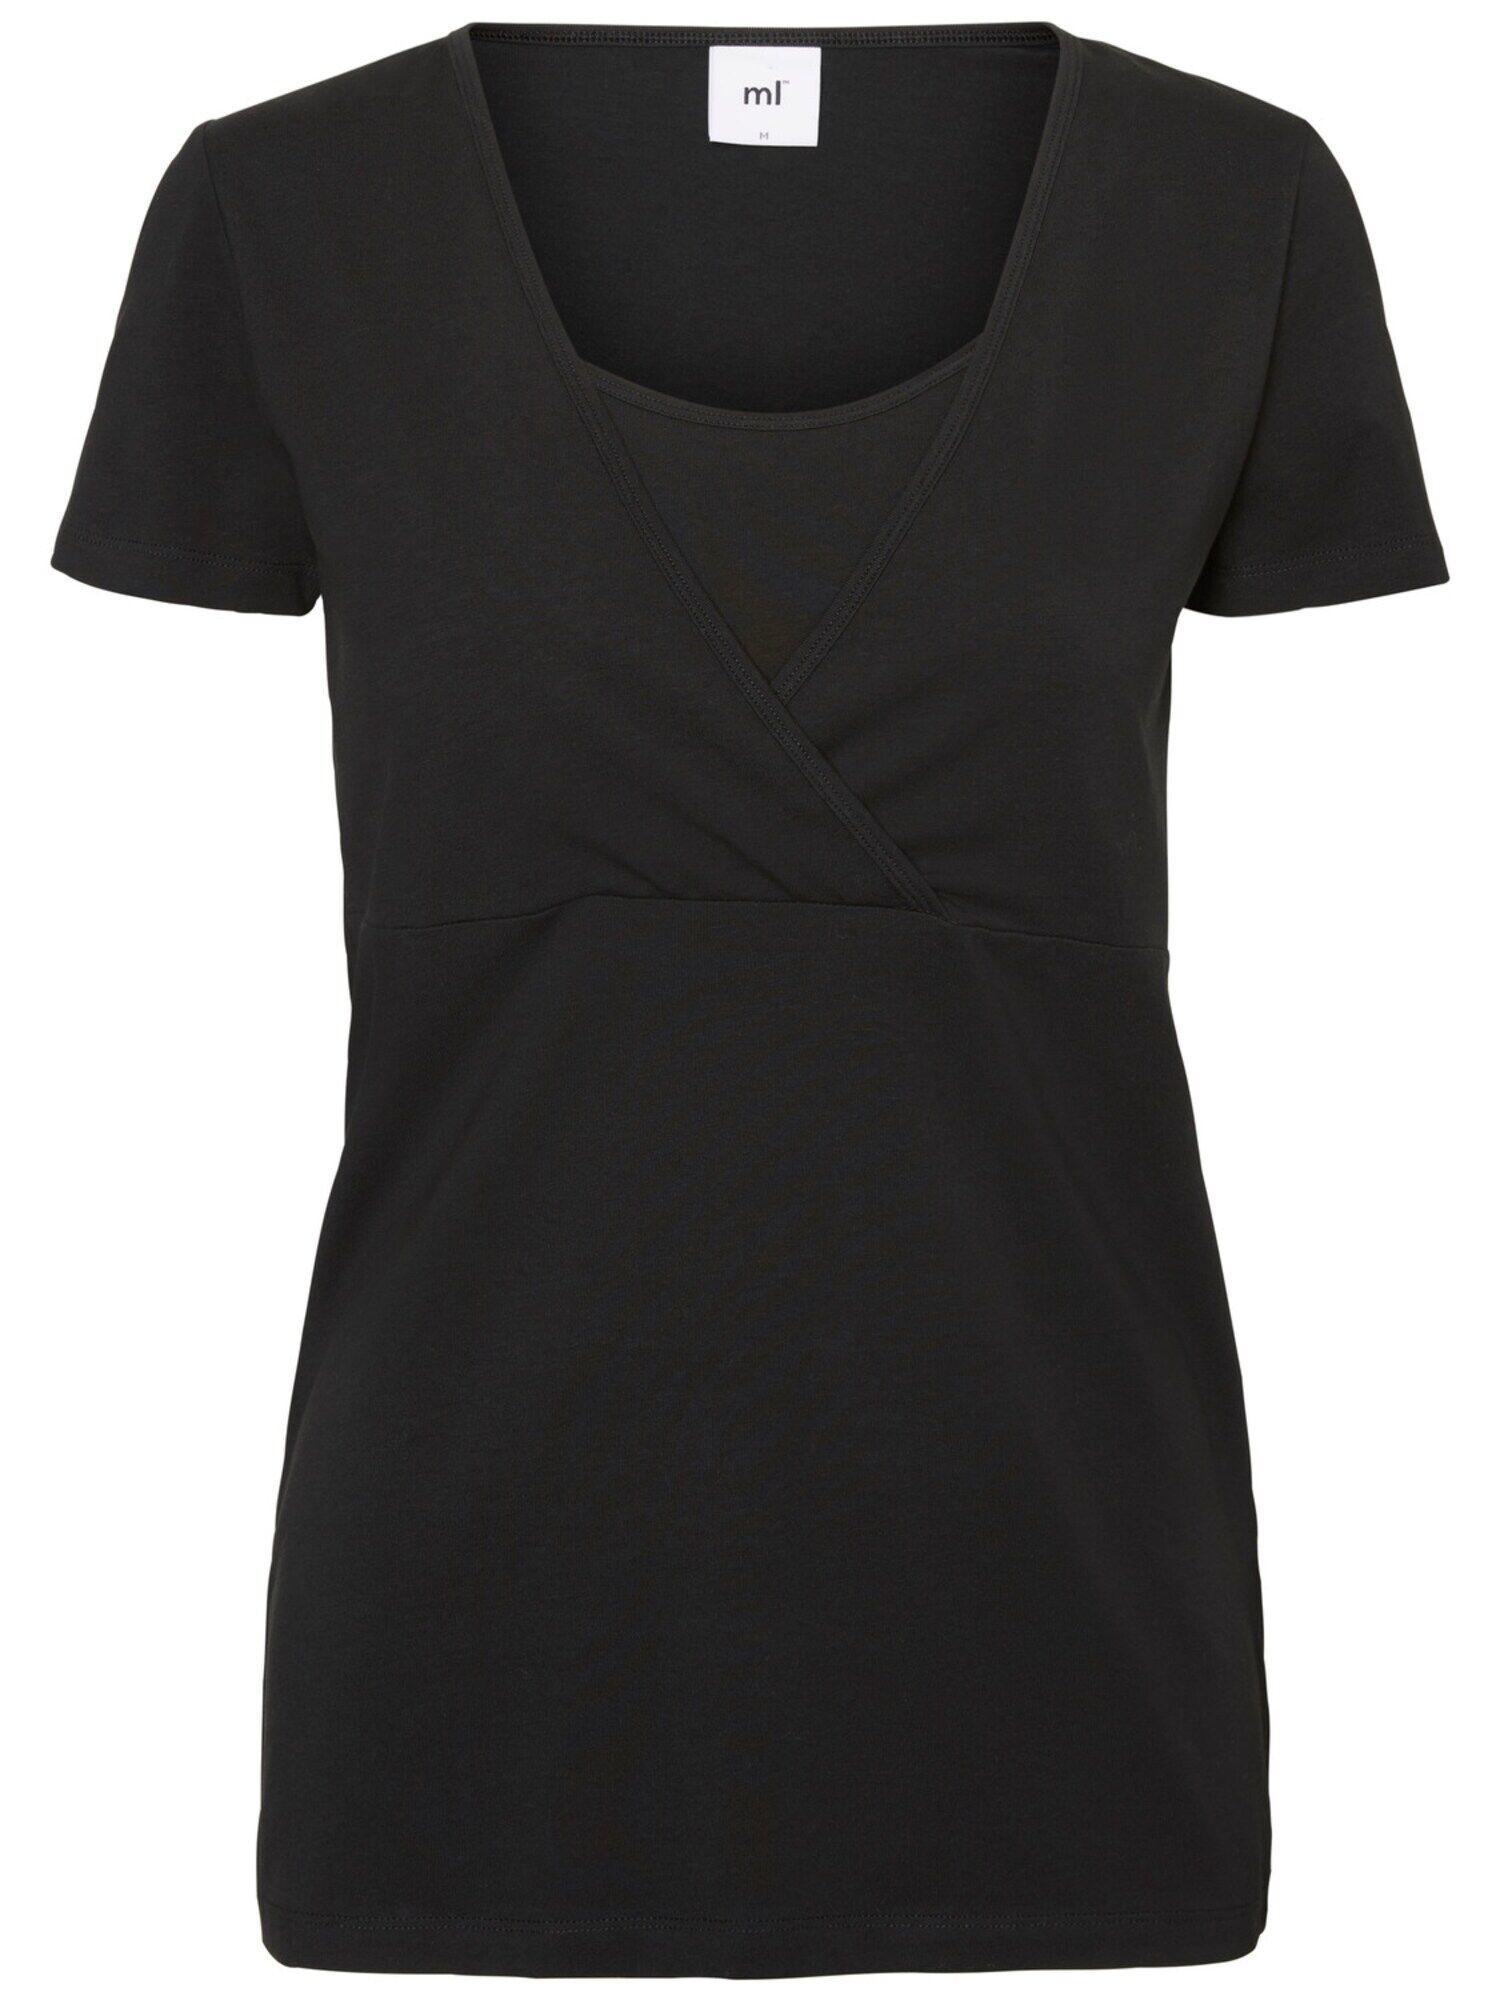 MAMALICIOUS T-shirt  - Noir, Blanc - Taille: L - female